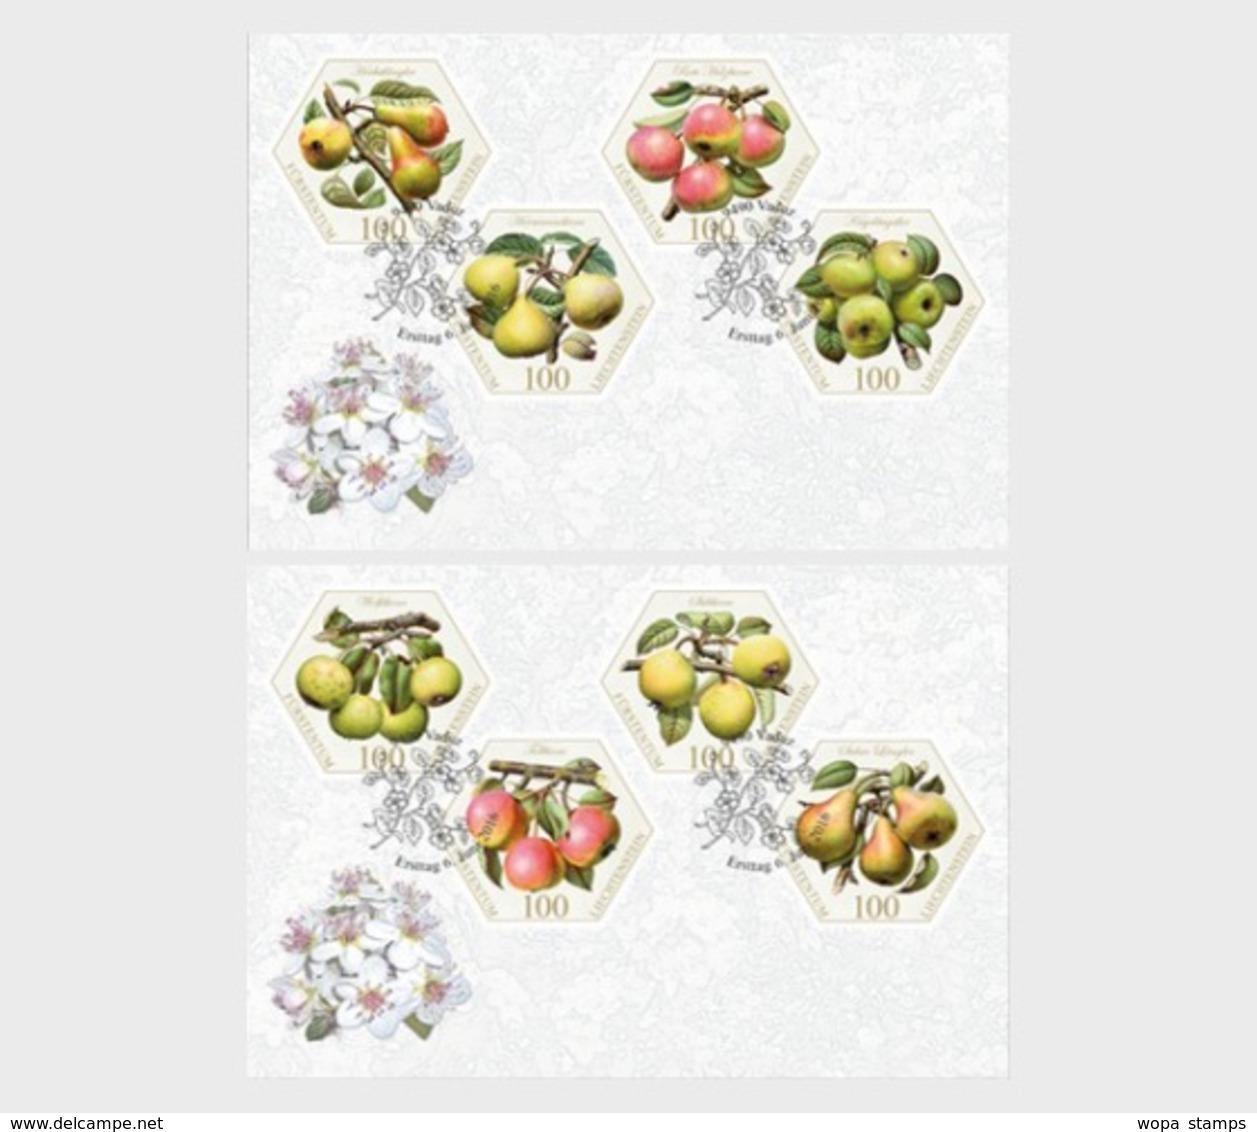 Liechtenstein 2016 First Day Cover - Old Fruit Varieties - Pears - Liechtenstein